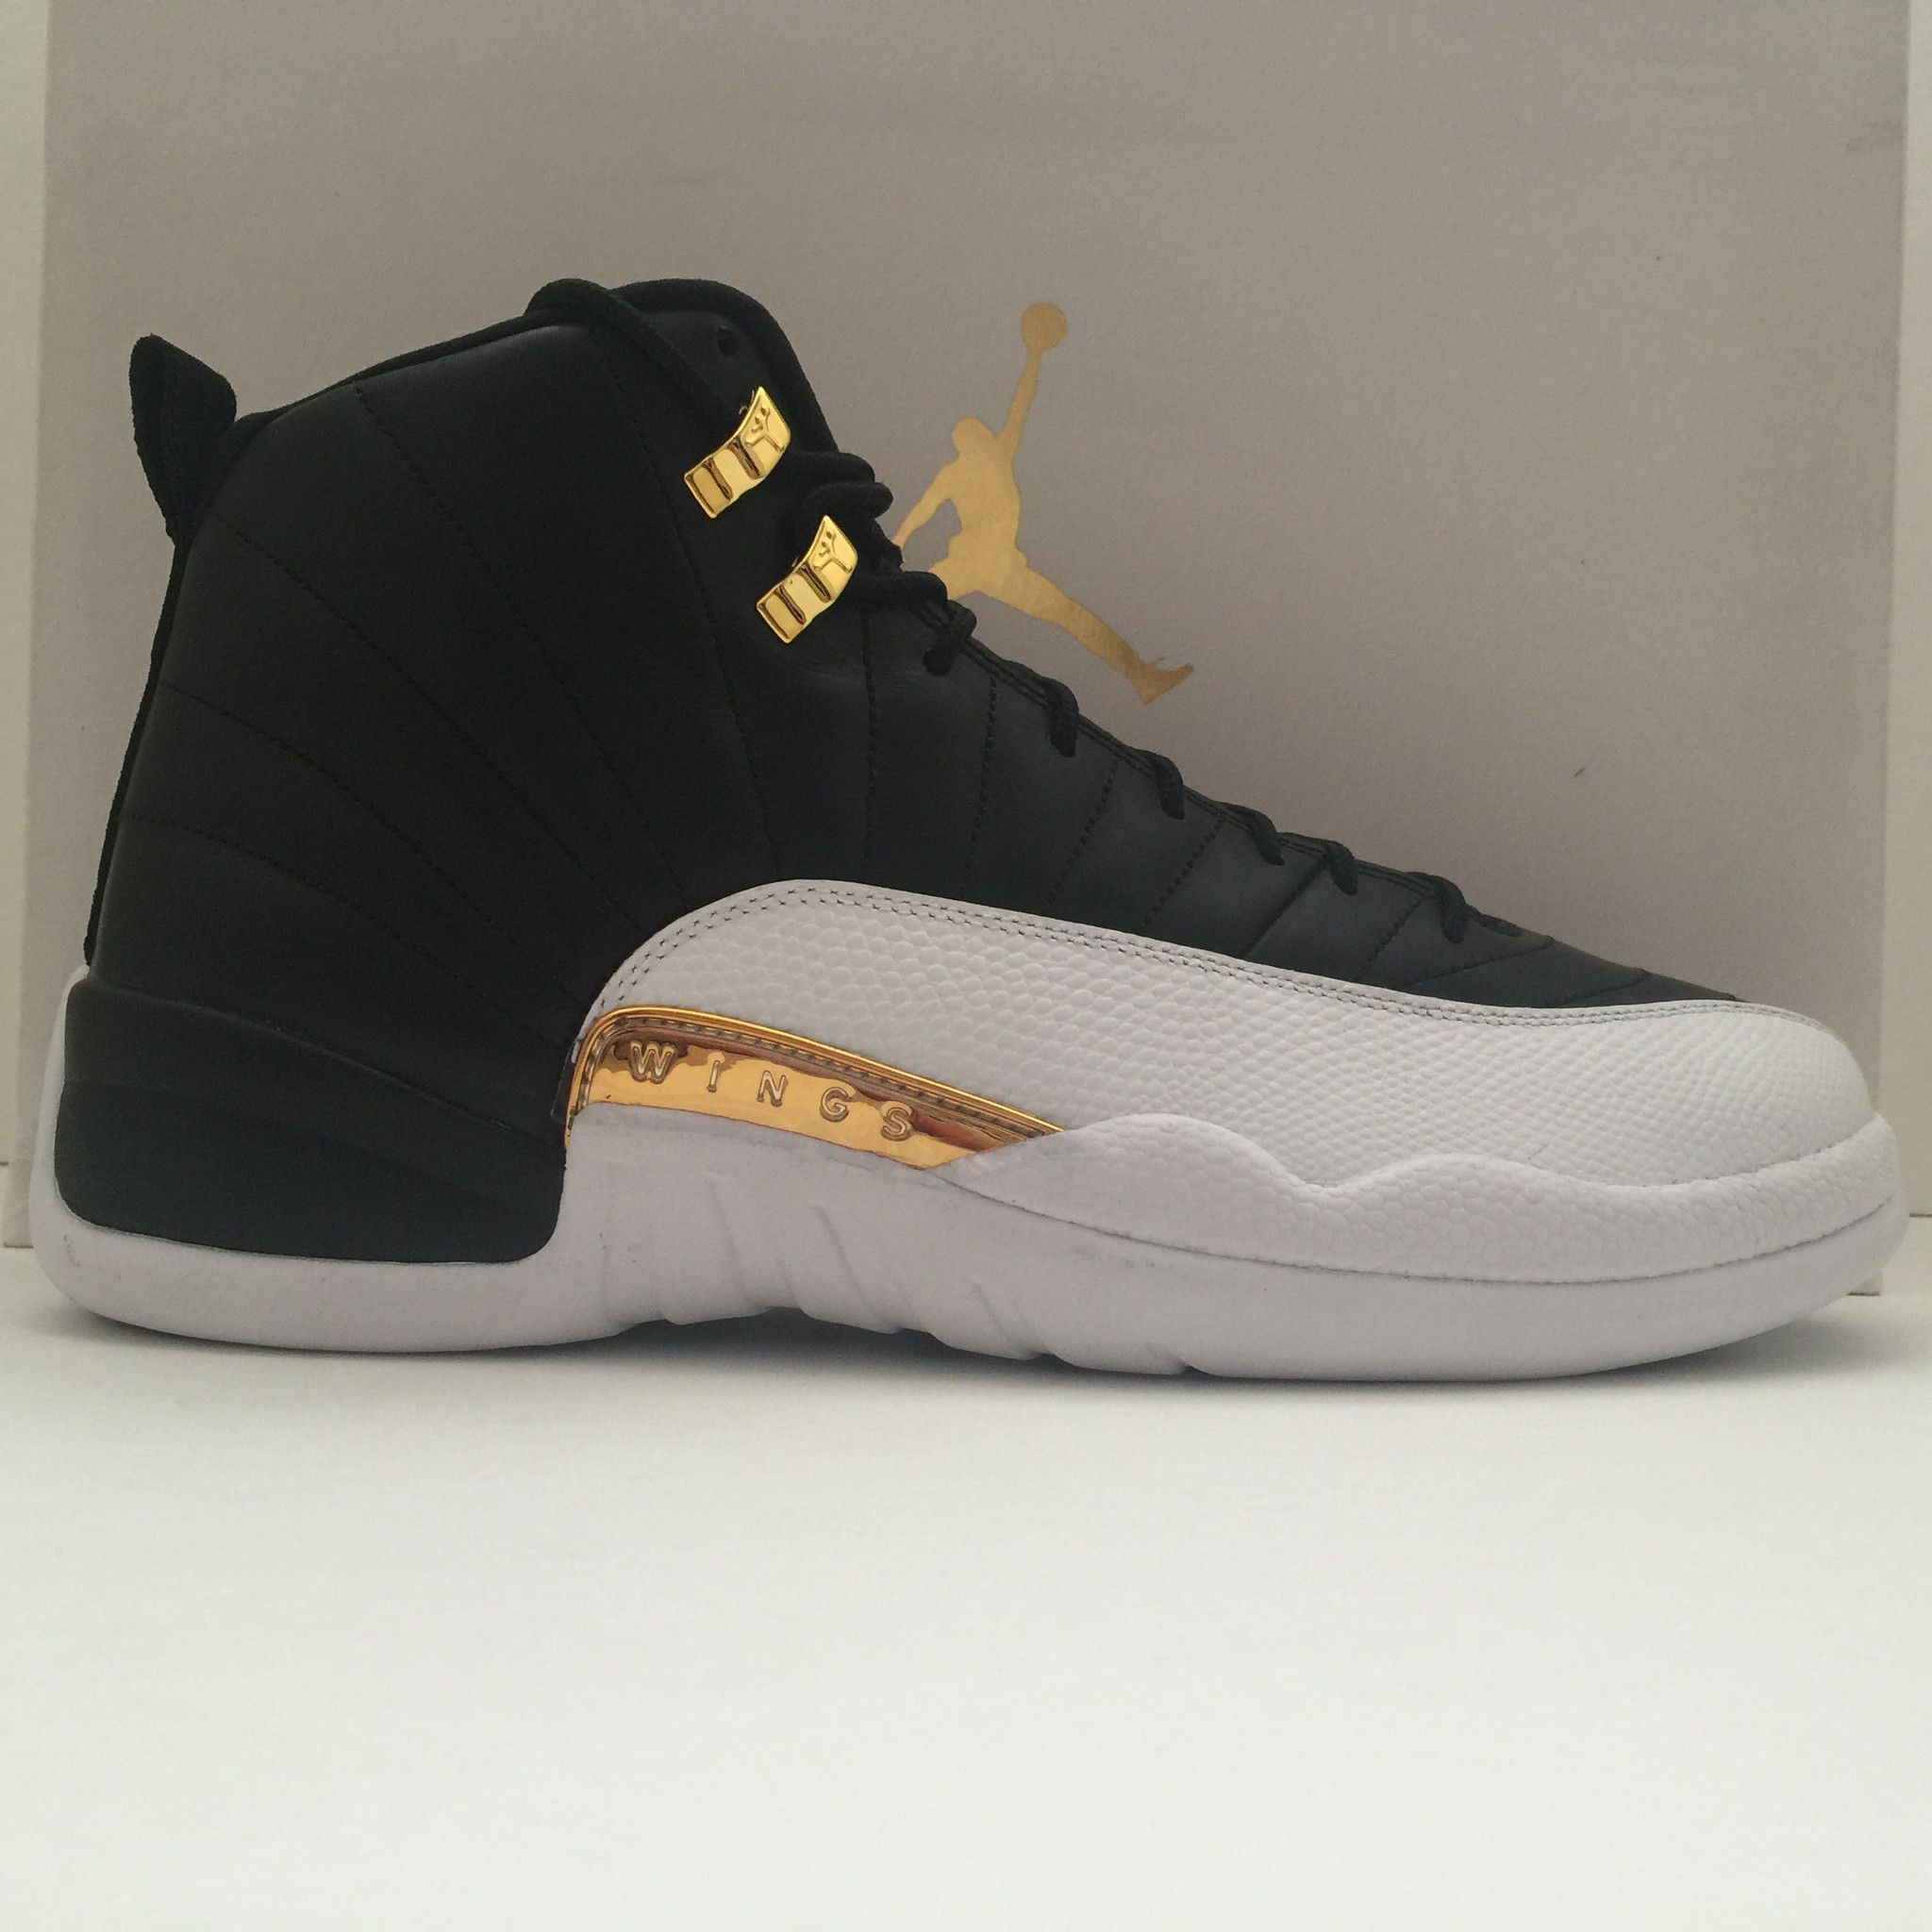 DS Nike Air Jordan 12 XII Retro Wings